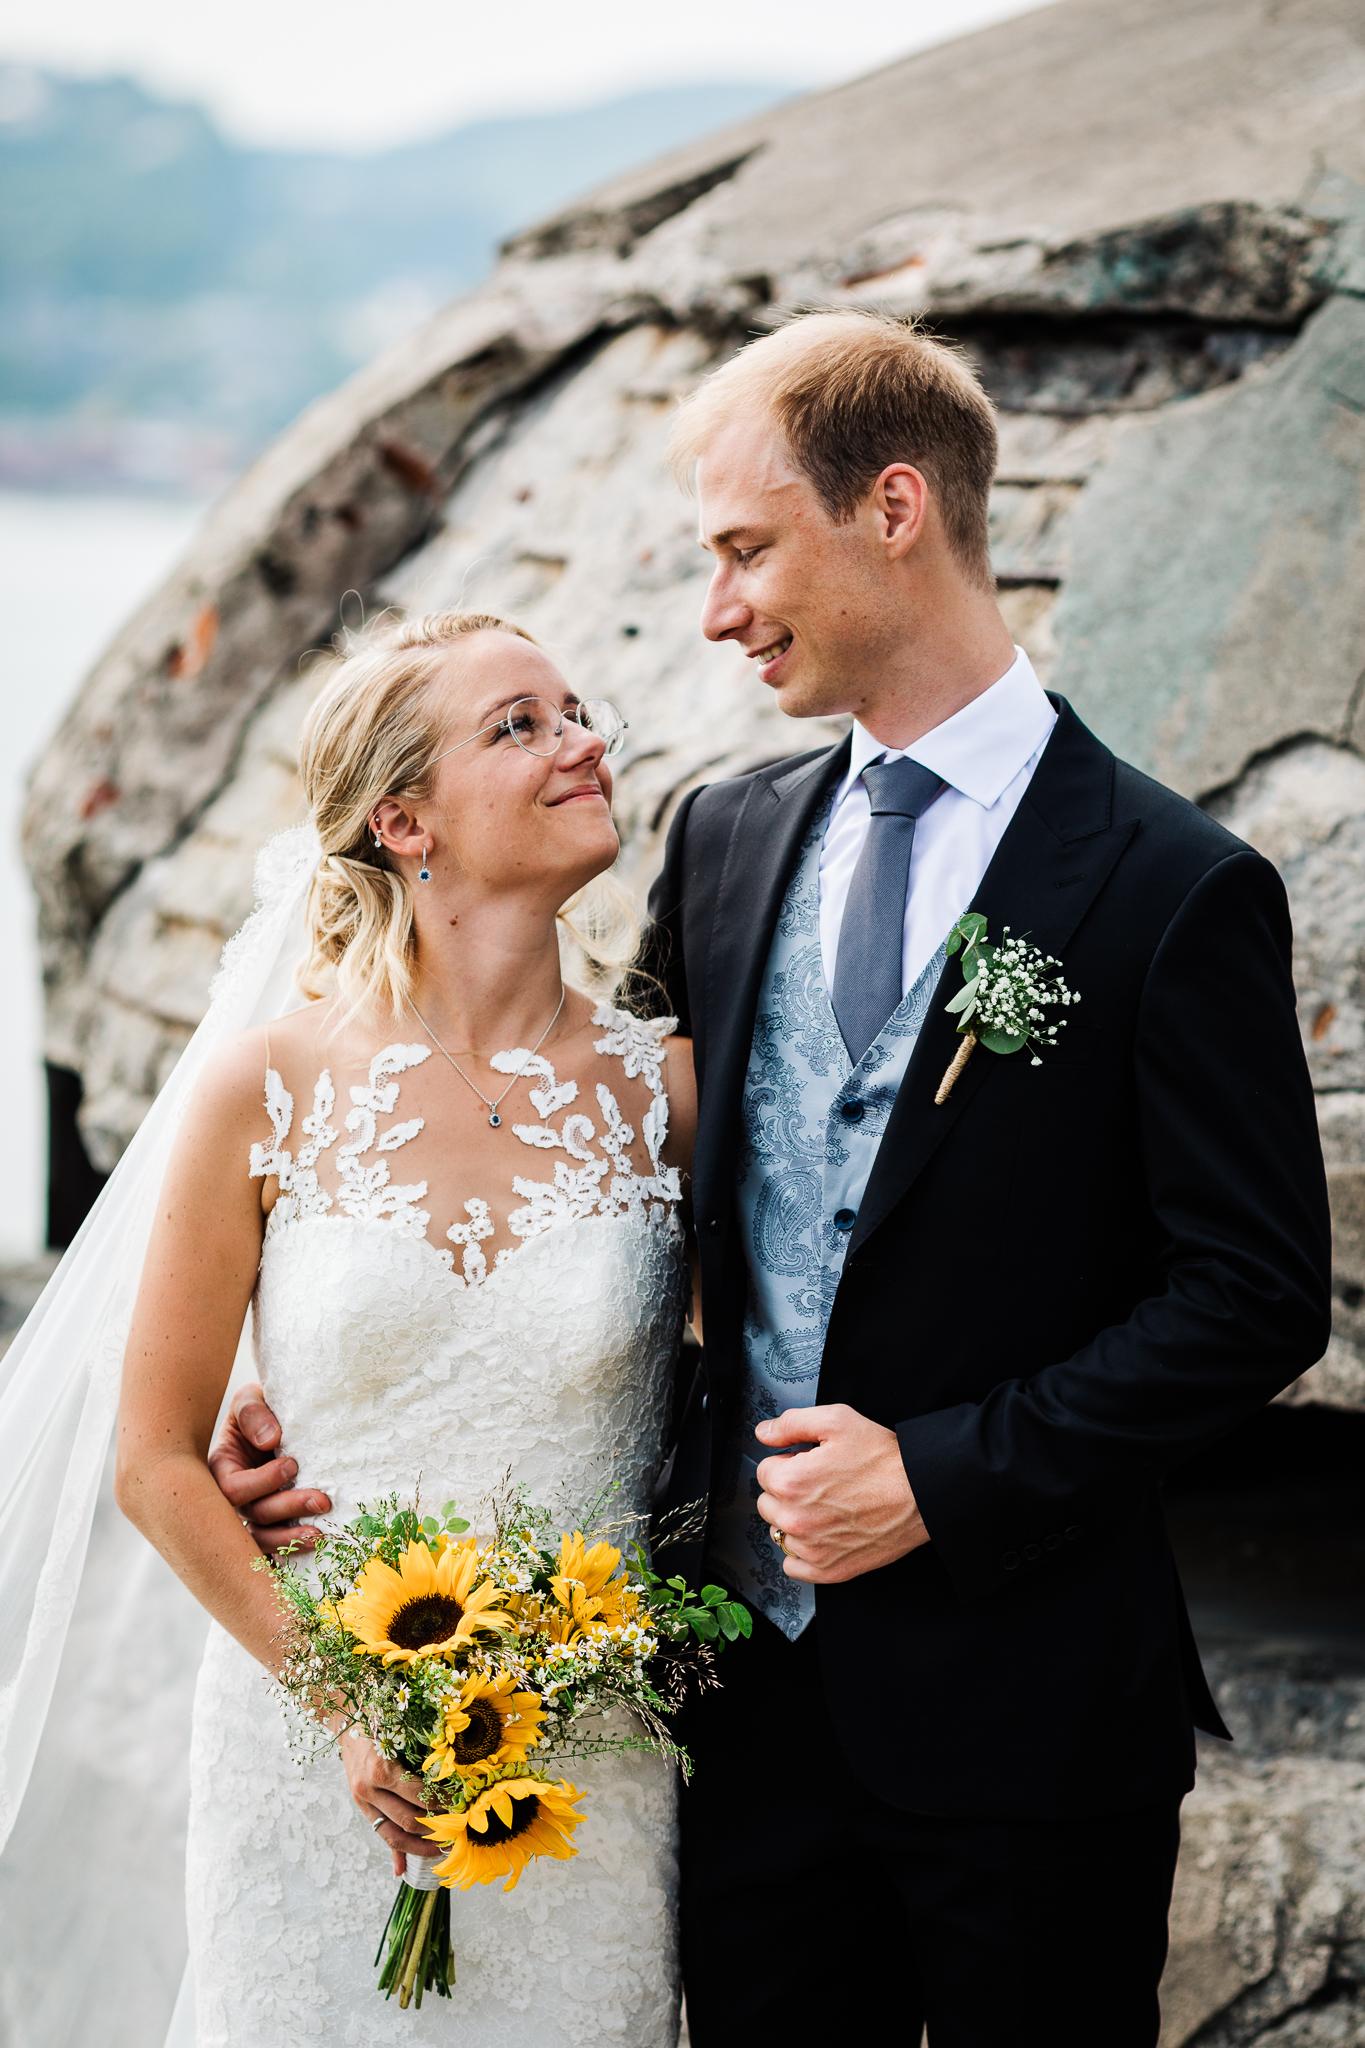 Bryllup_web-1.jpg